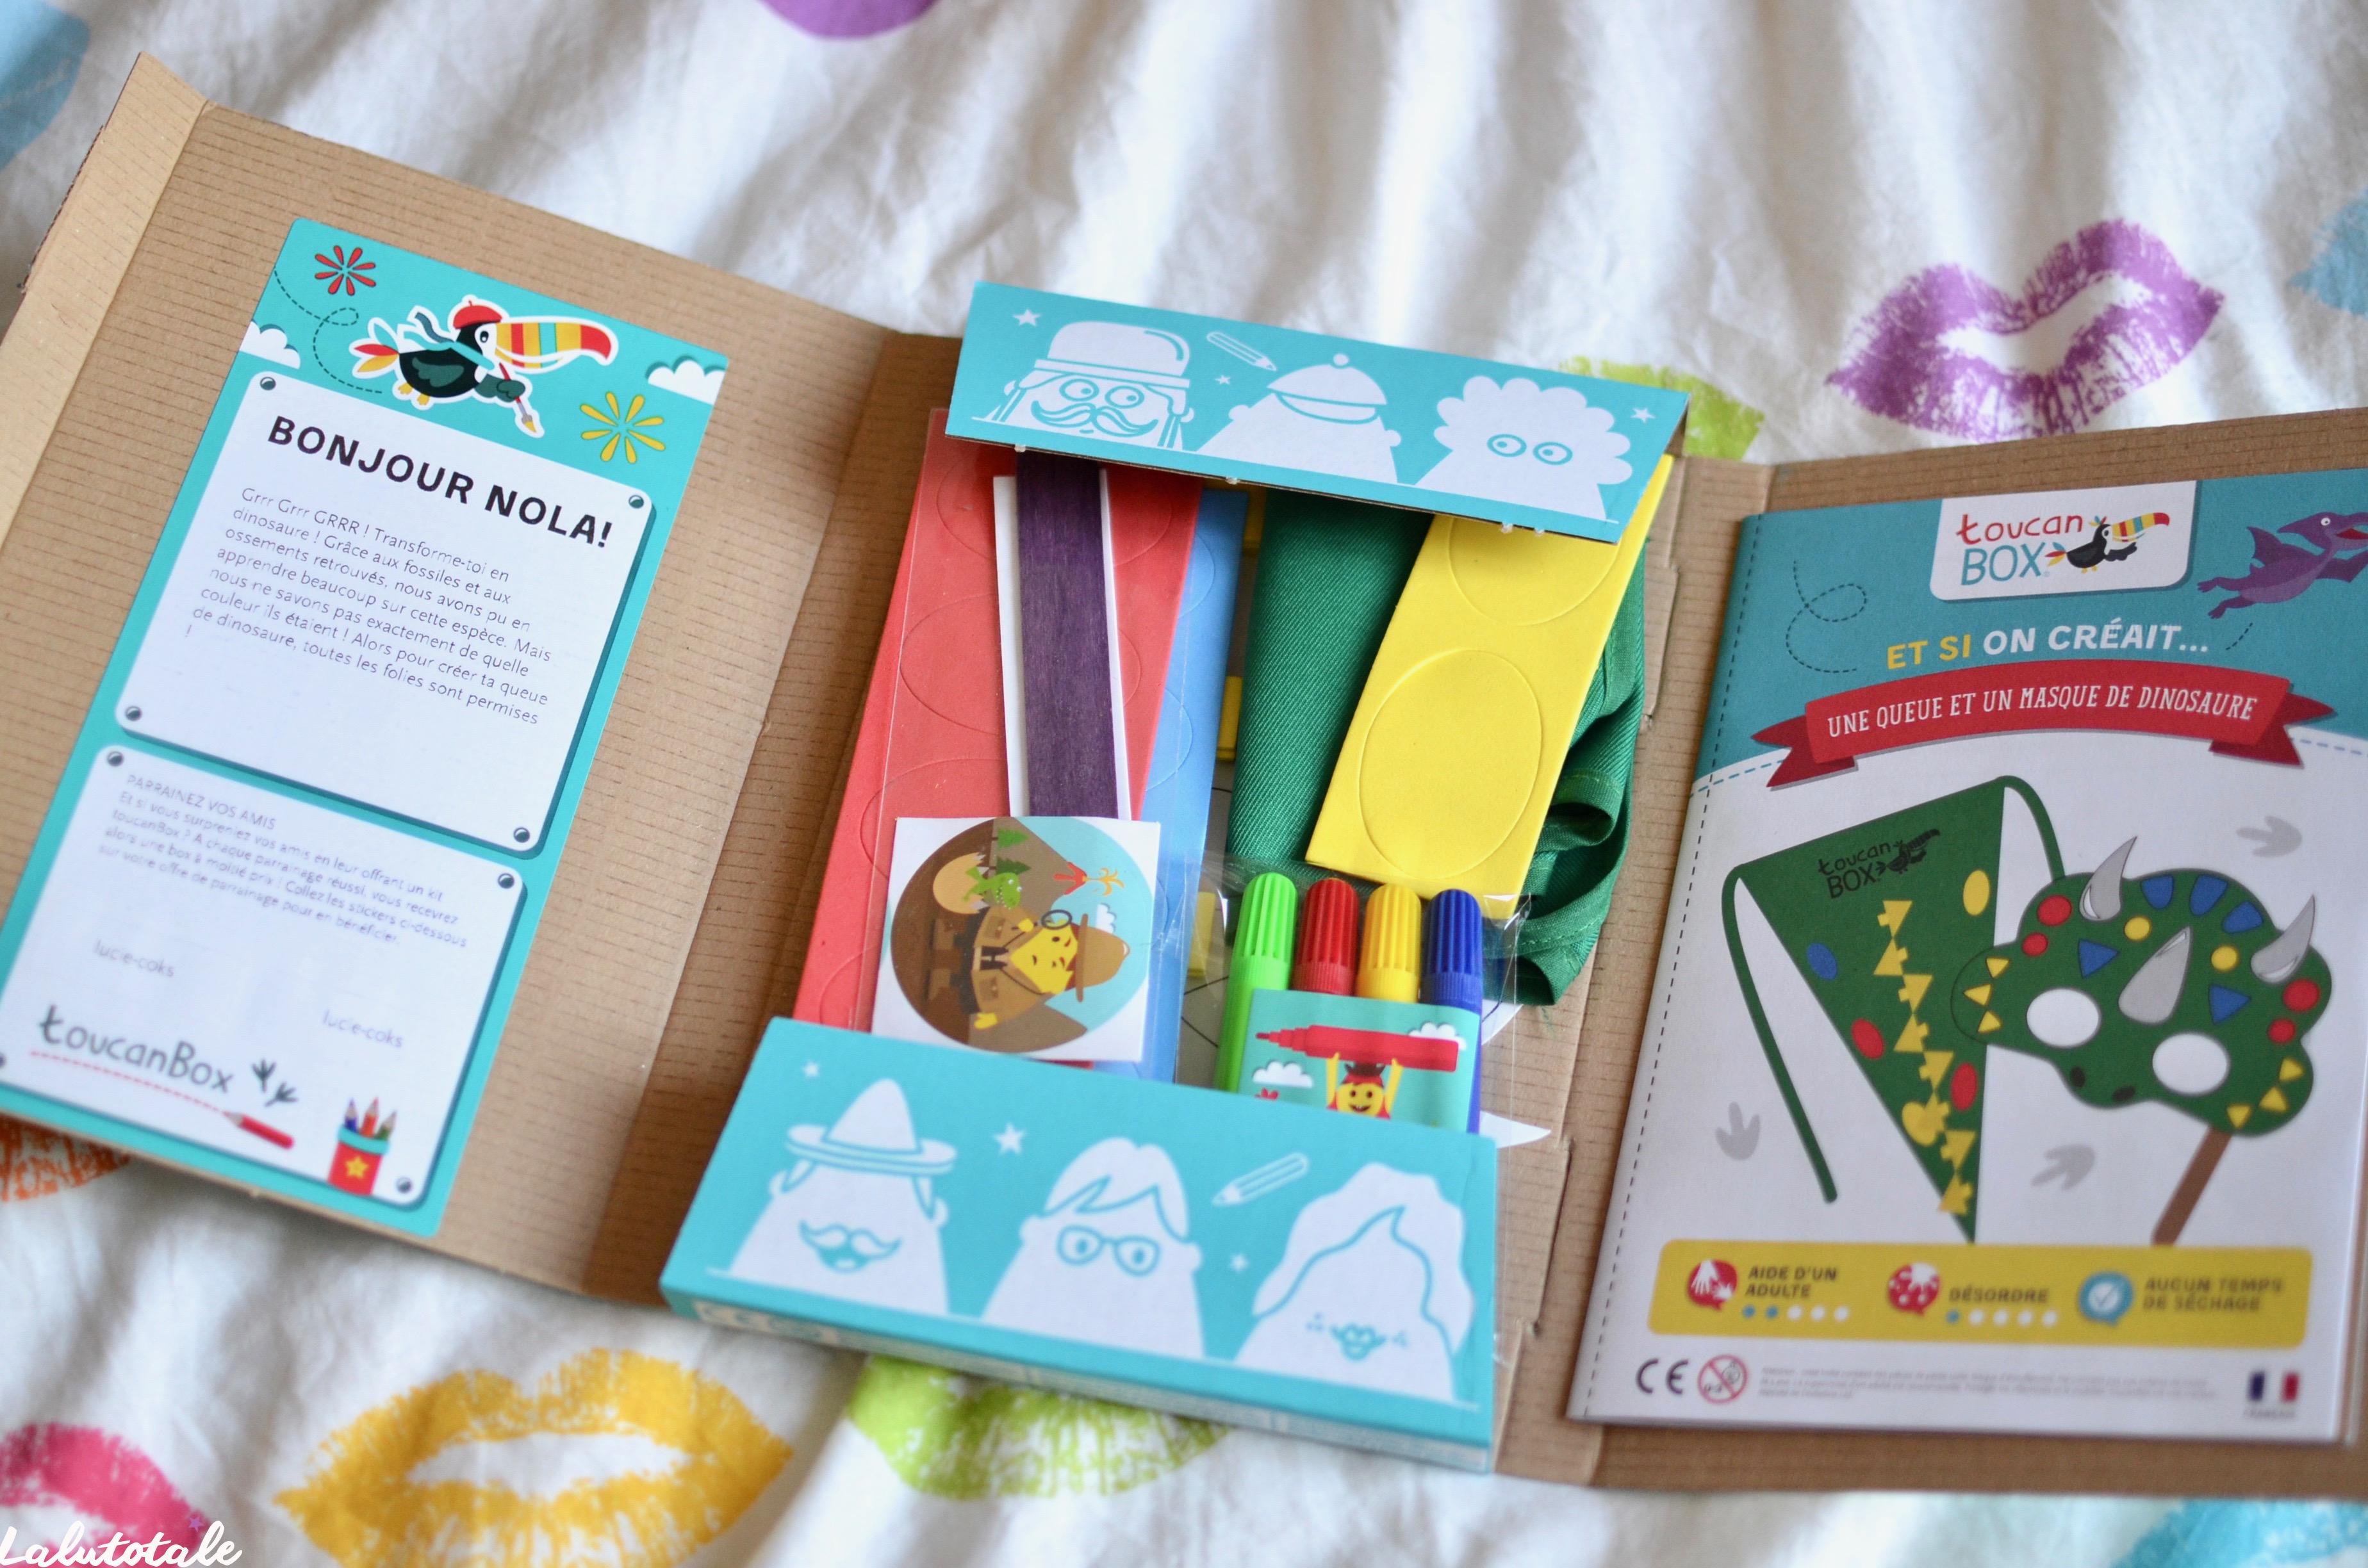 ( Toucanbox ) LaLutine se transforme en dino avec sa box d'activités créatives ! 🦖